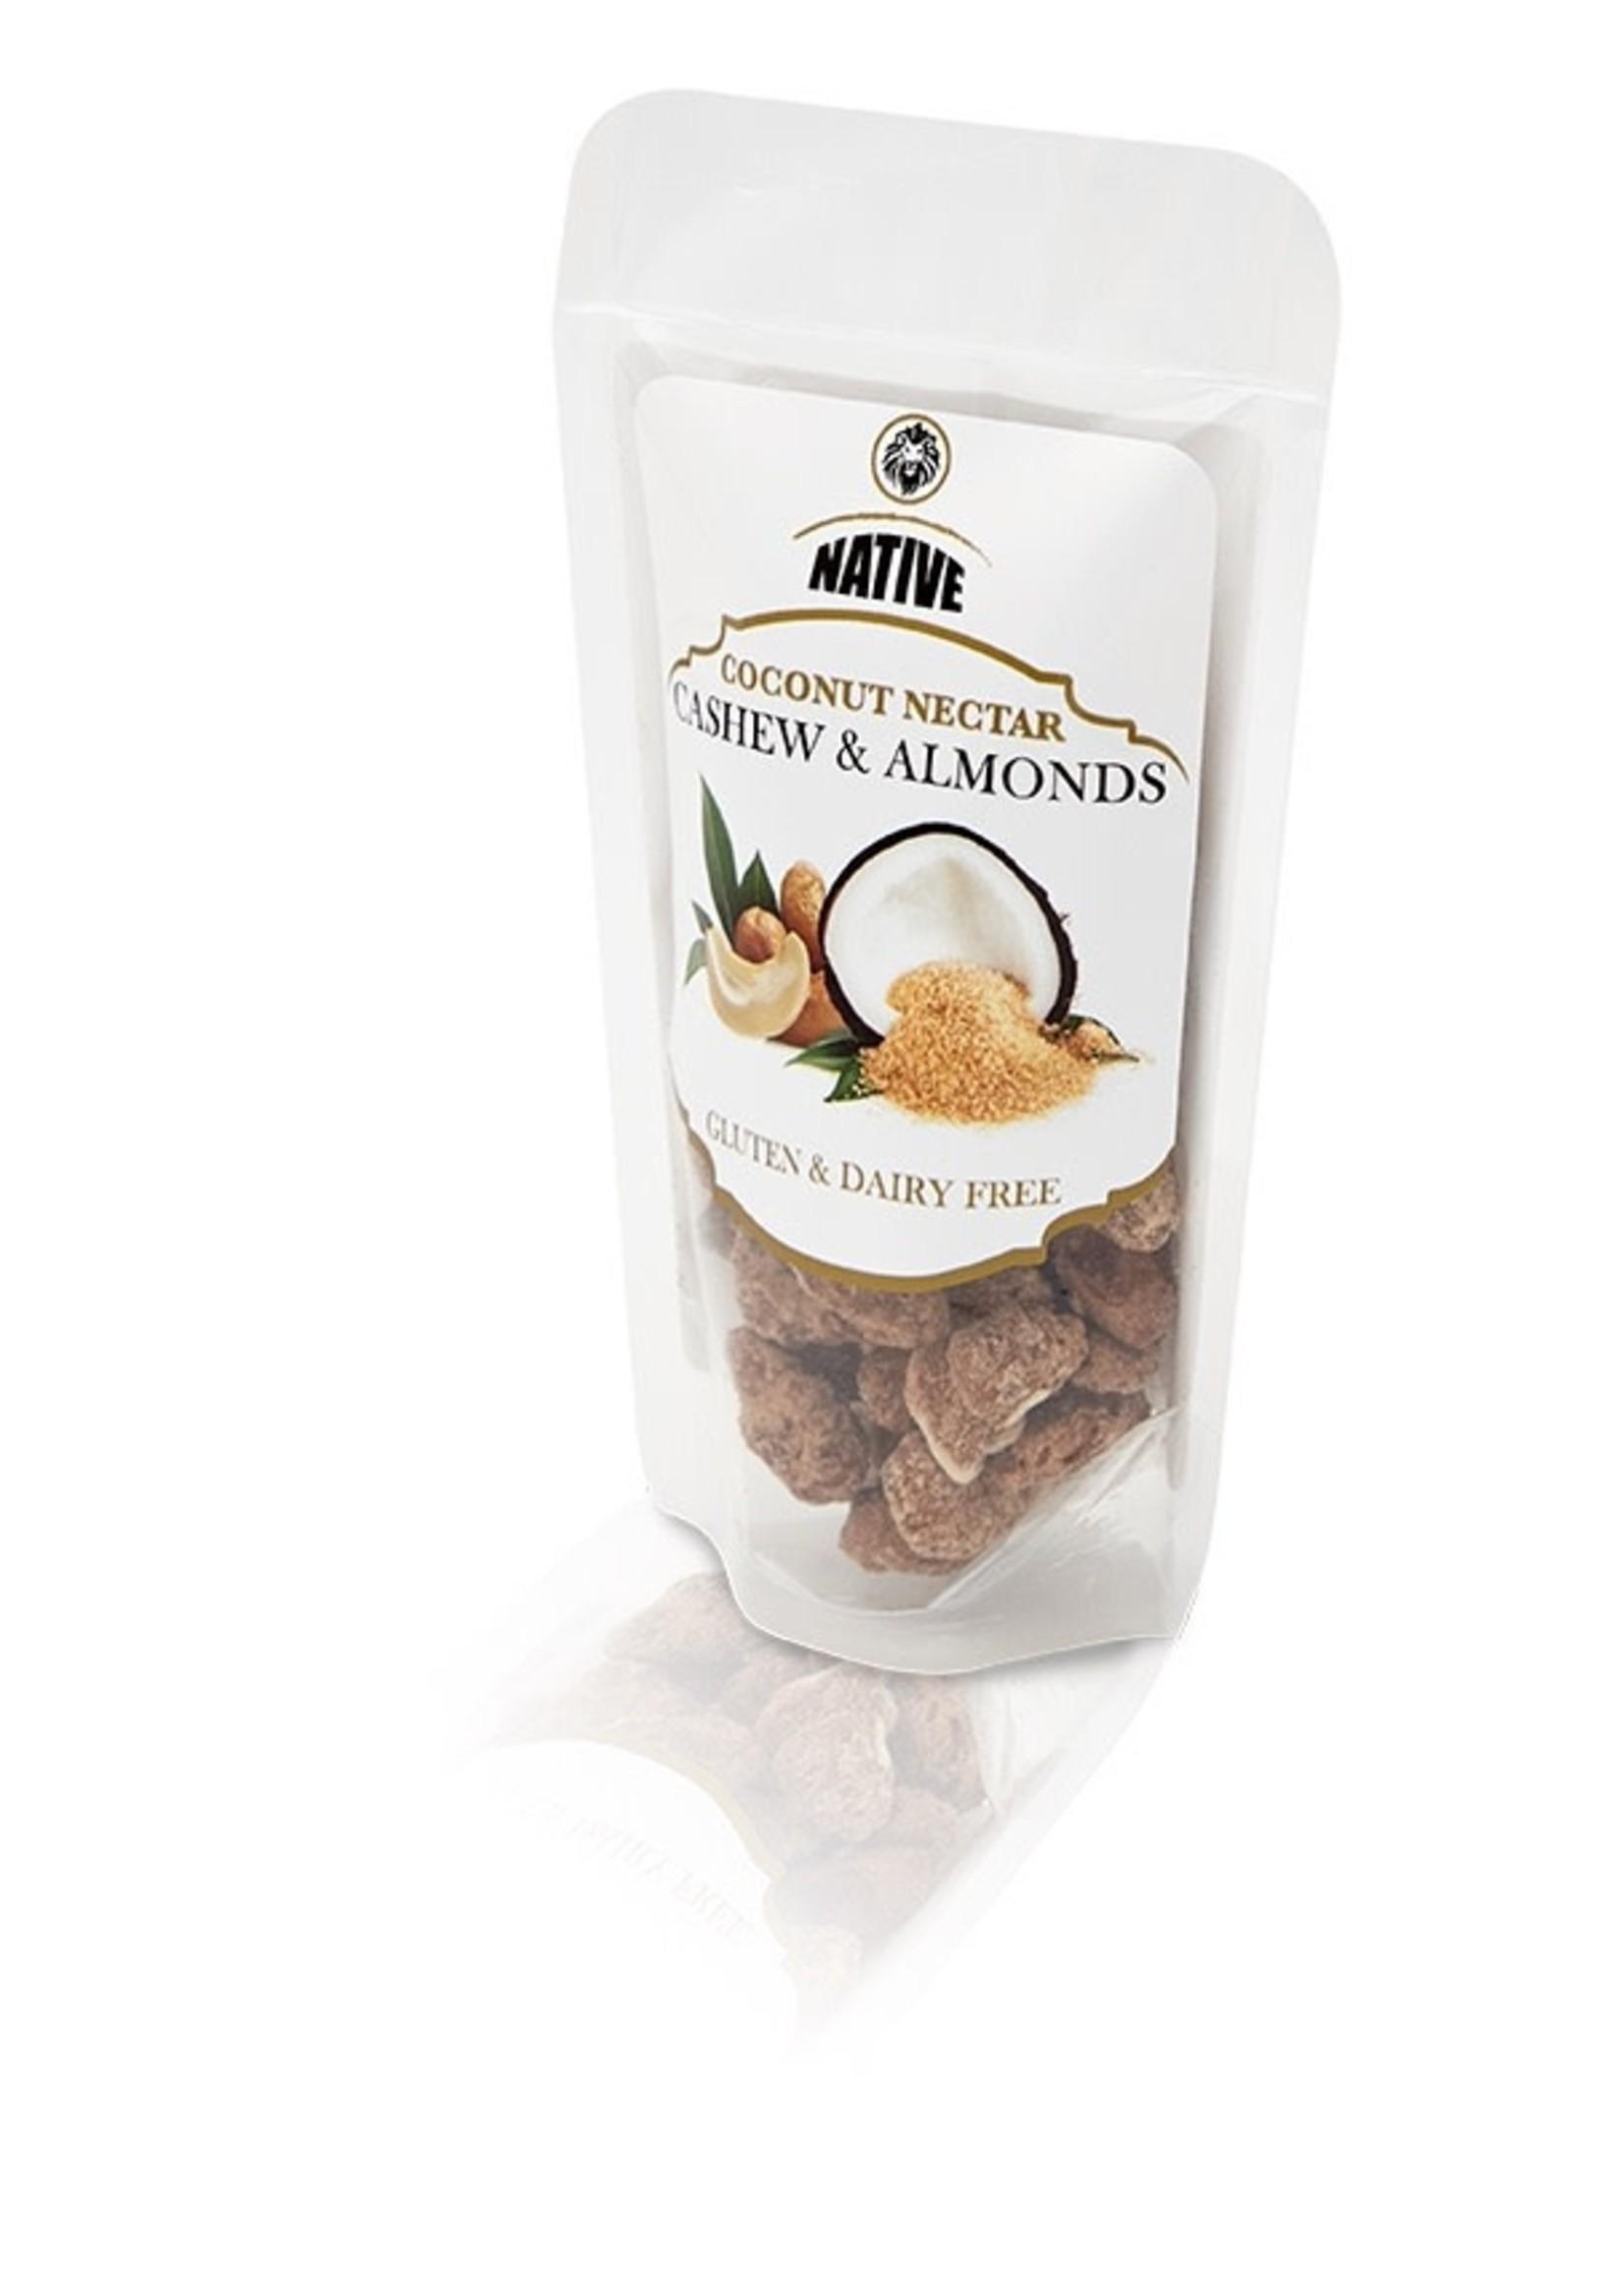 Native Native - Cashew & Almond- Coconut Nectar Caramel 50g